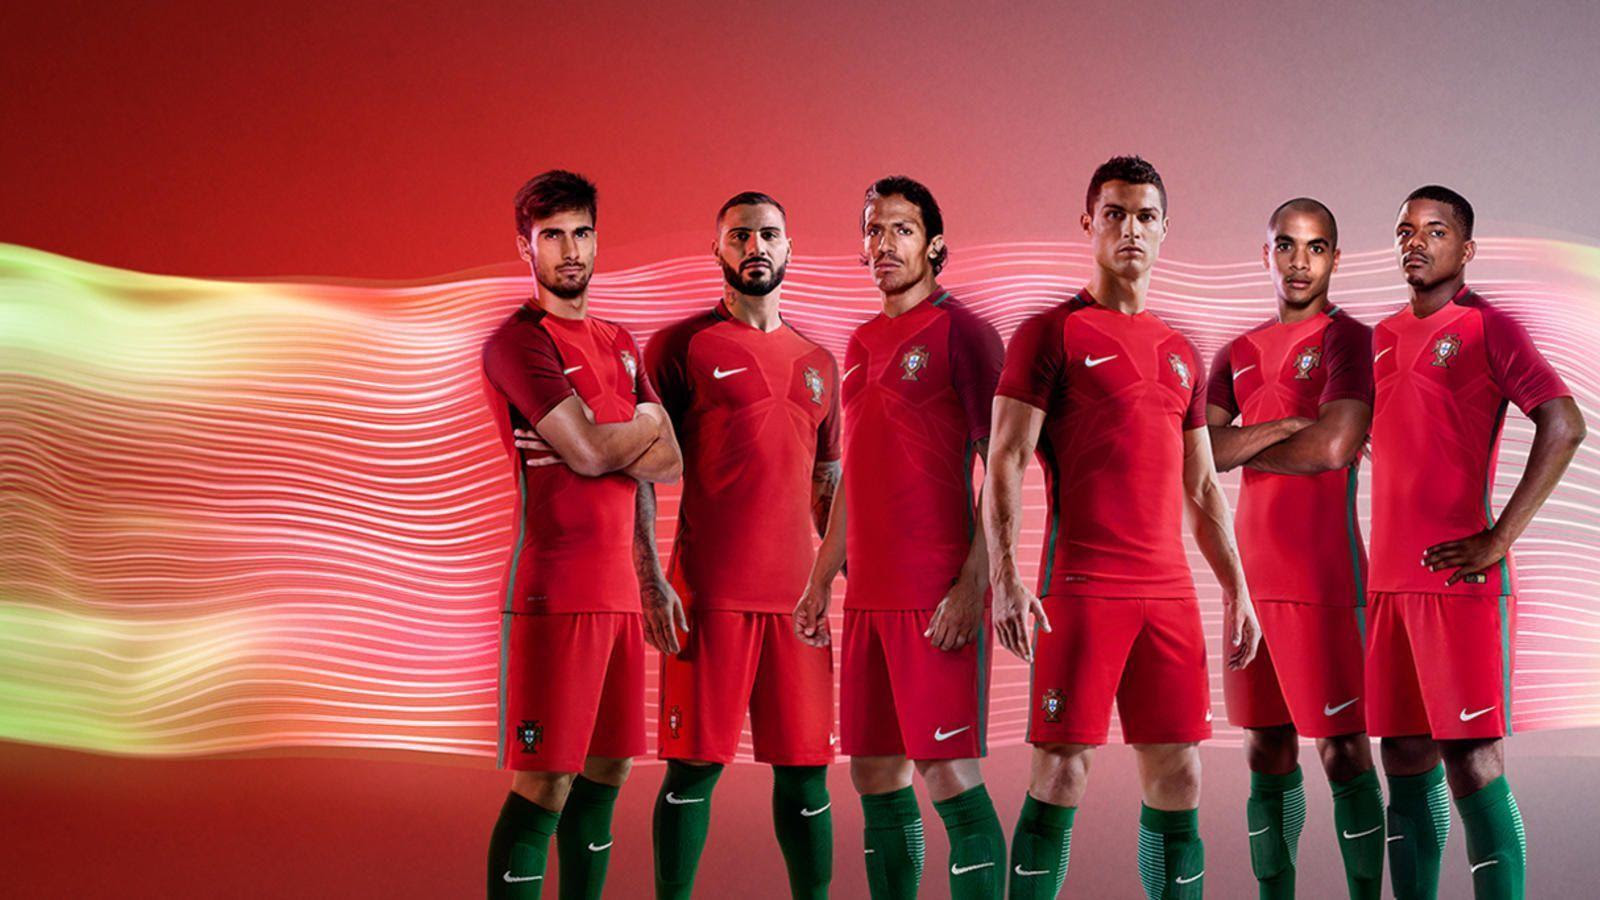 National Football Teams 2016 HD Wallpapers - Wallpaper Cave